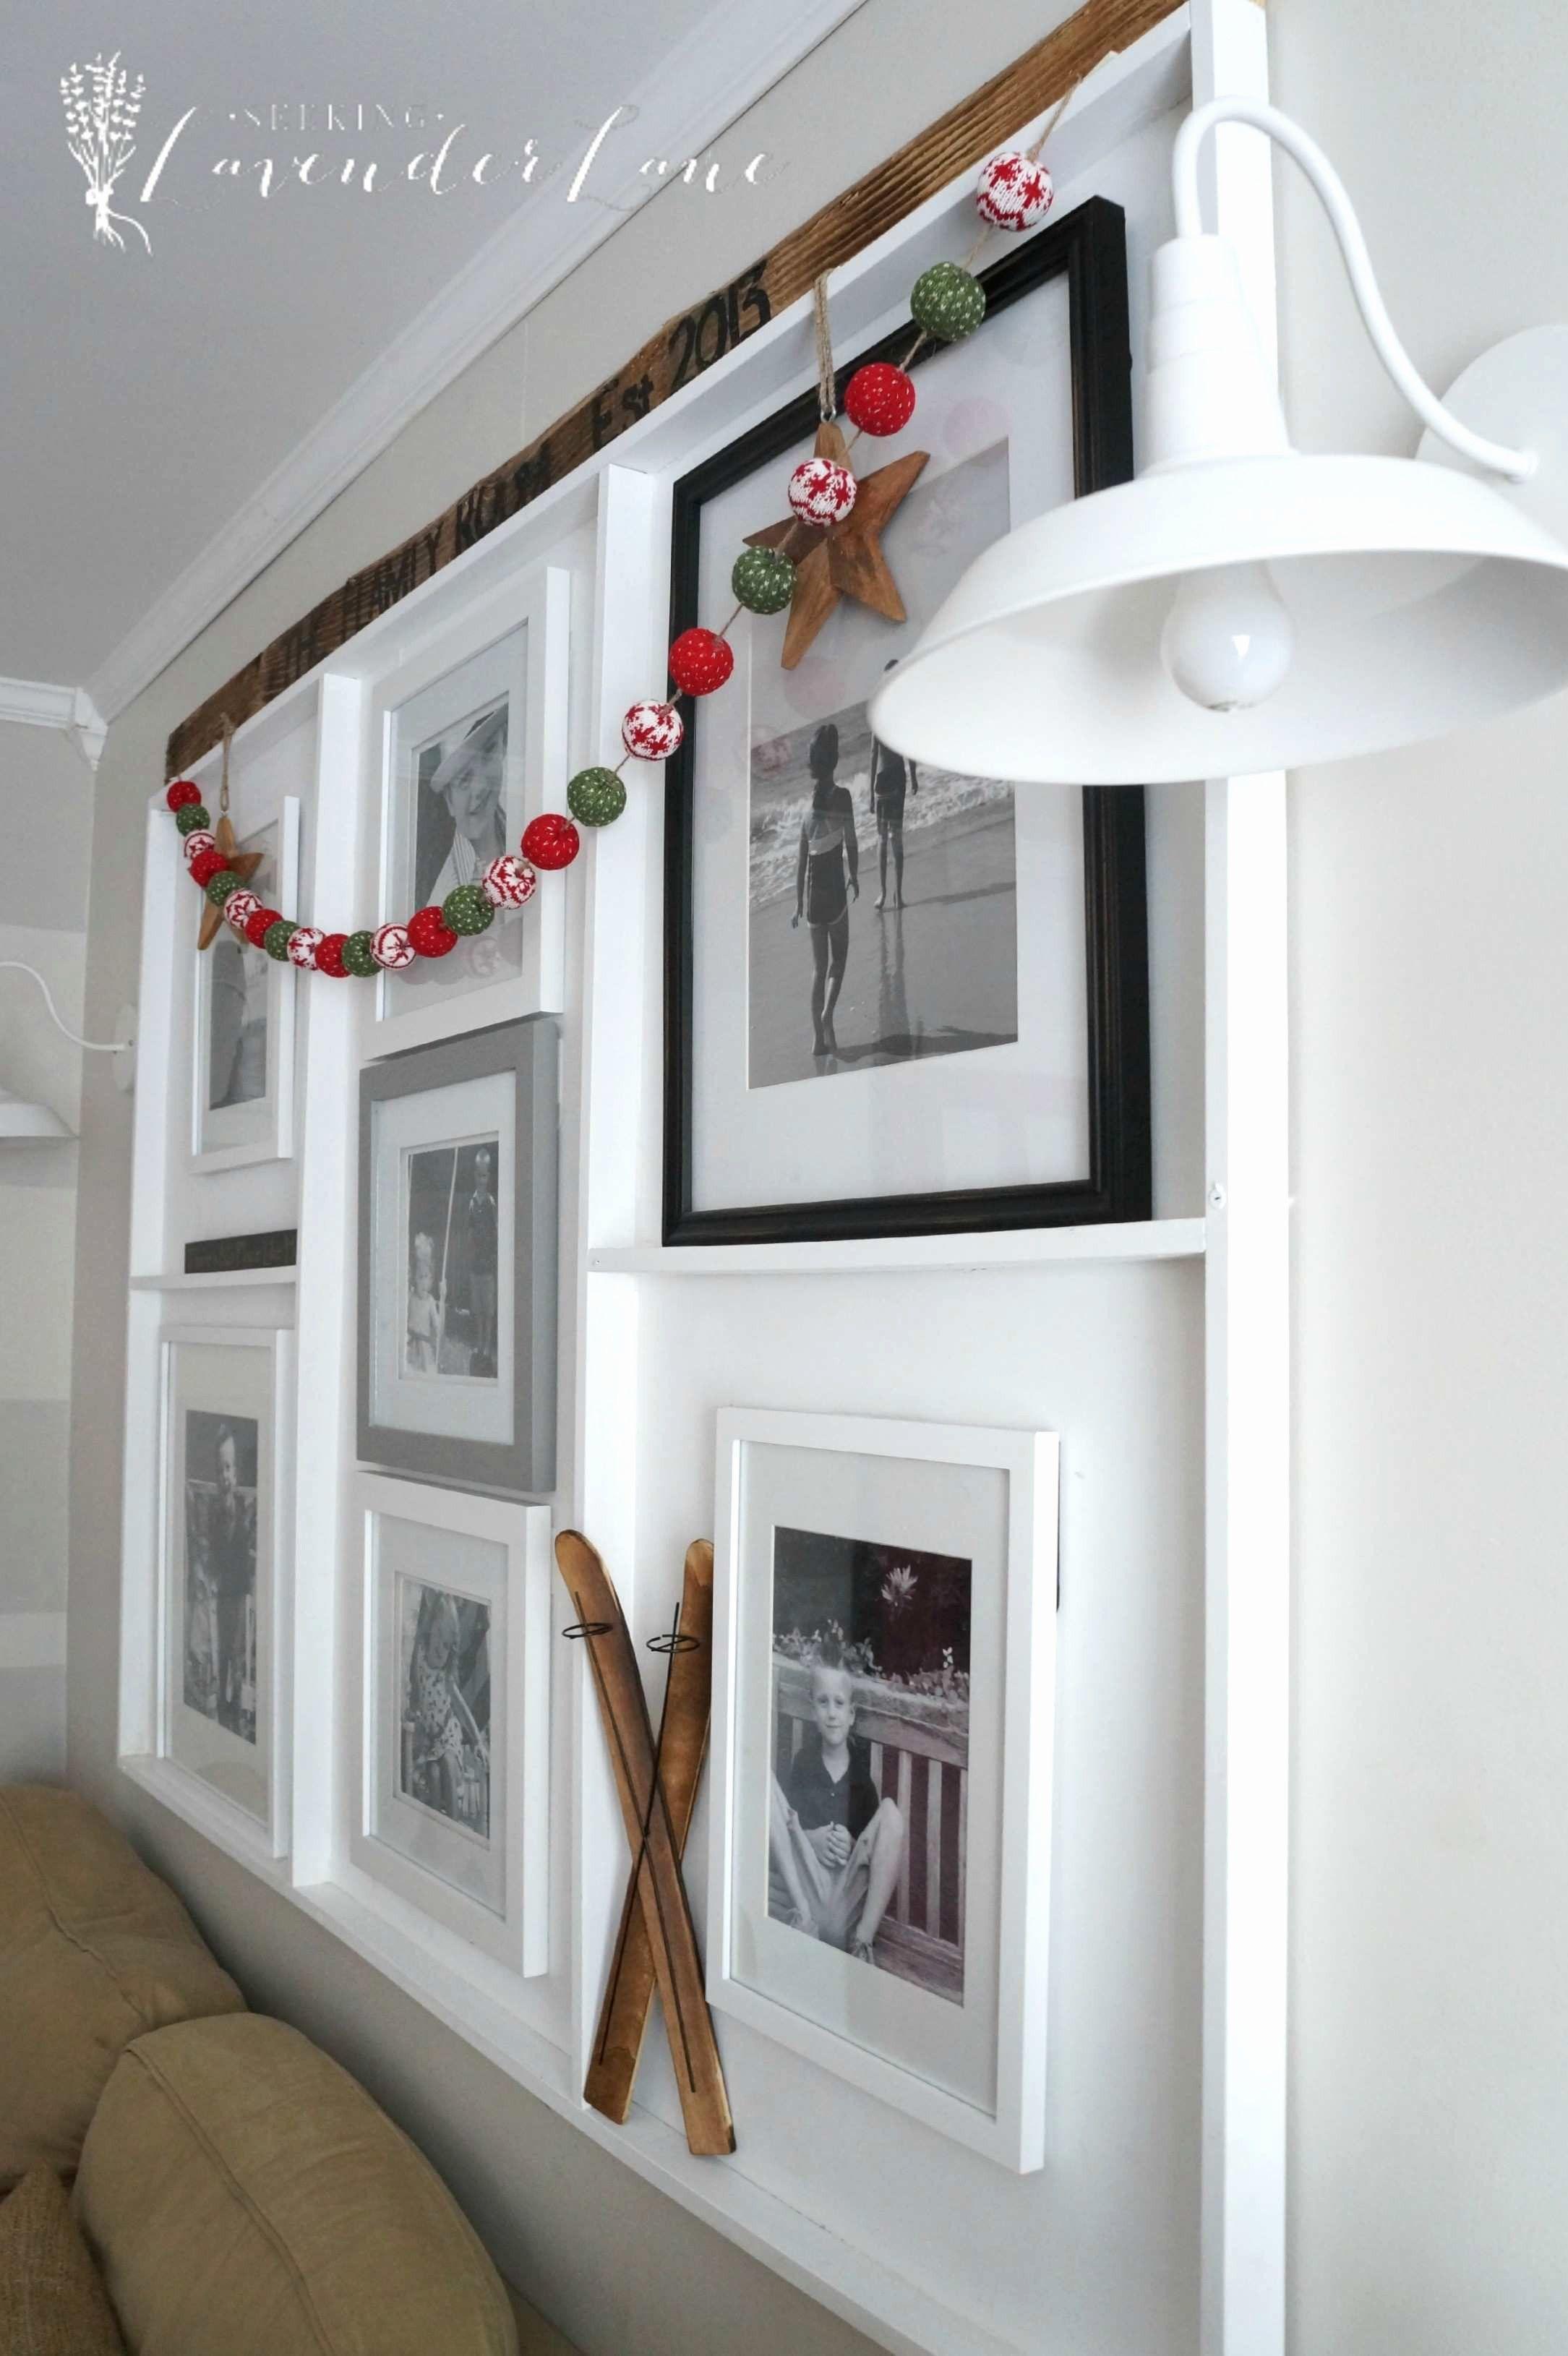 30 New Primitive Home Decor Elegant Bedroom Decor Home Interior Design House Design